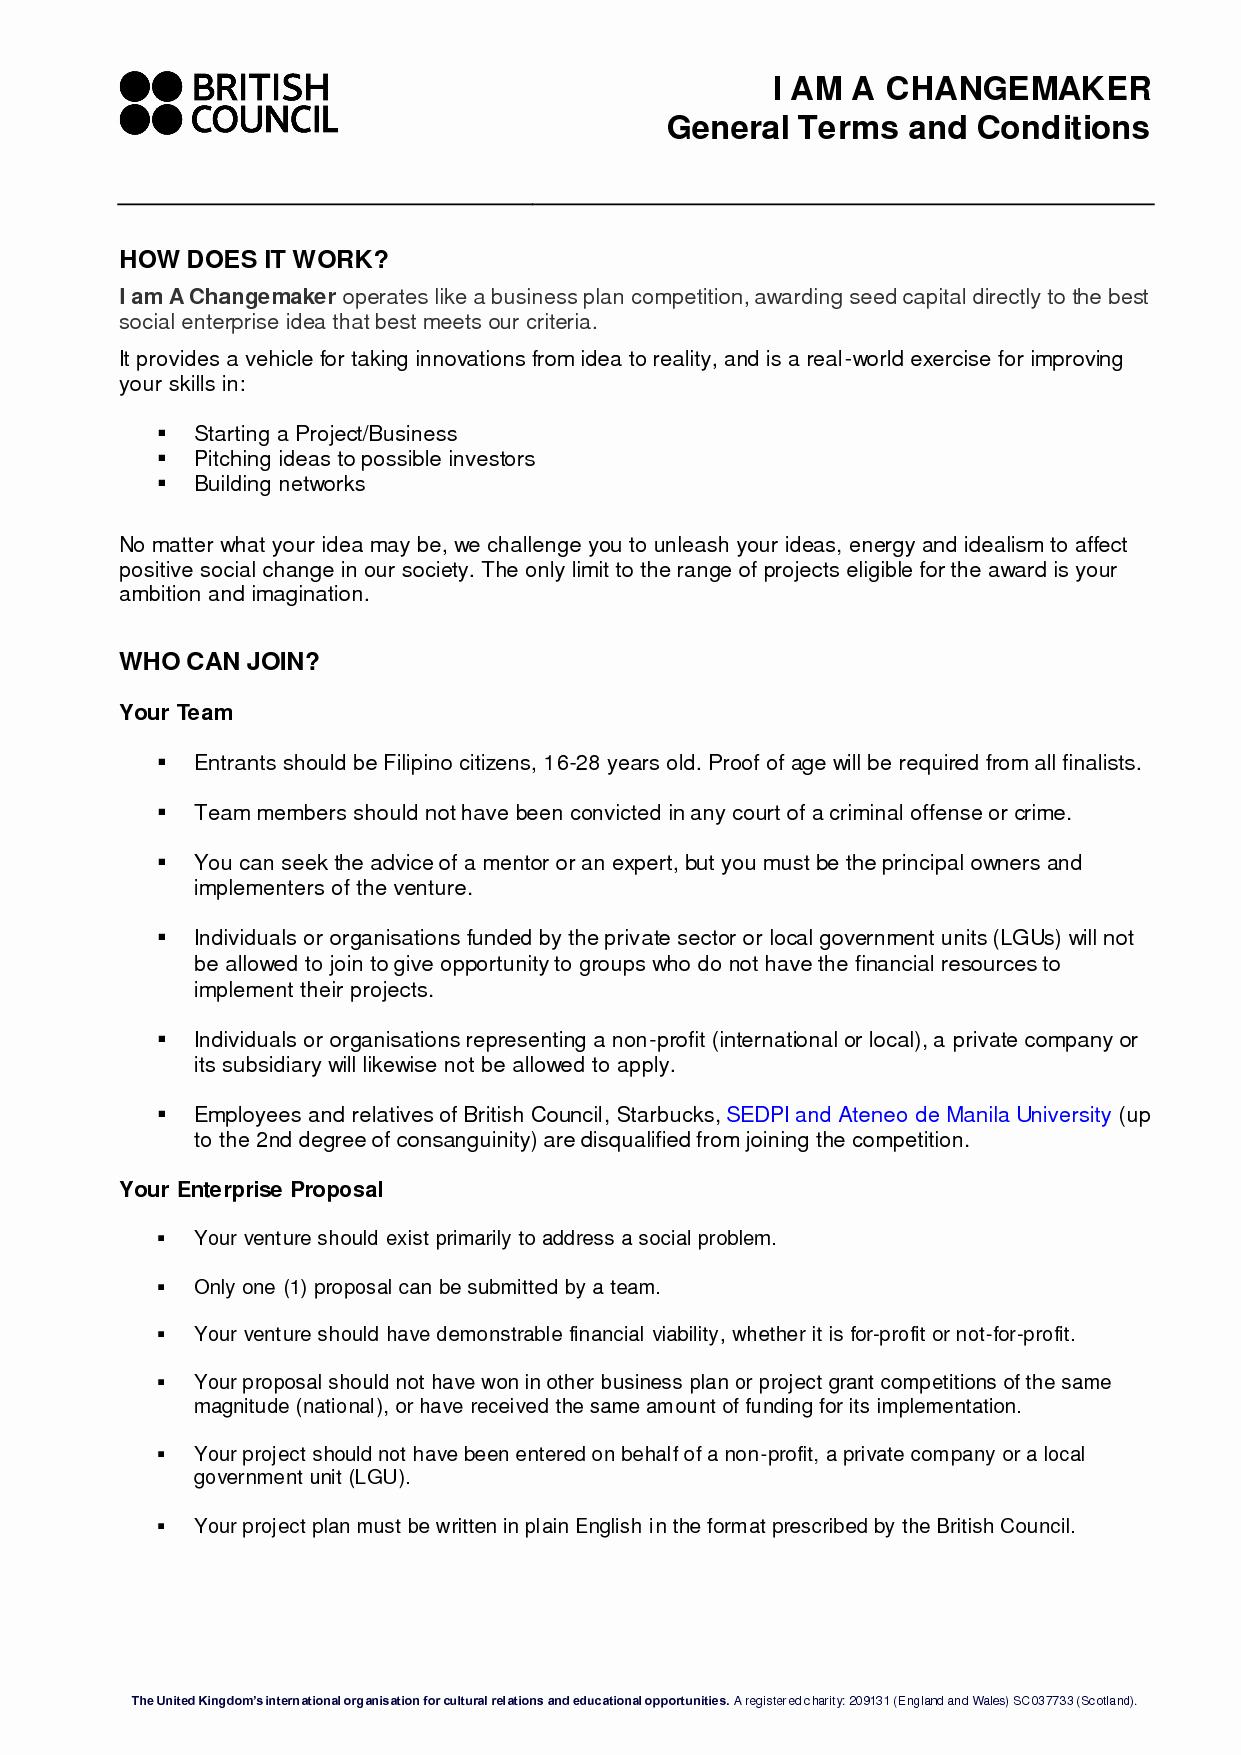 Free Printable Business Plan Template Elegant Free Printable Business Plan Sample form Generic